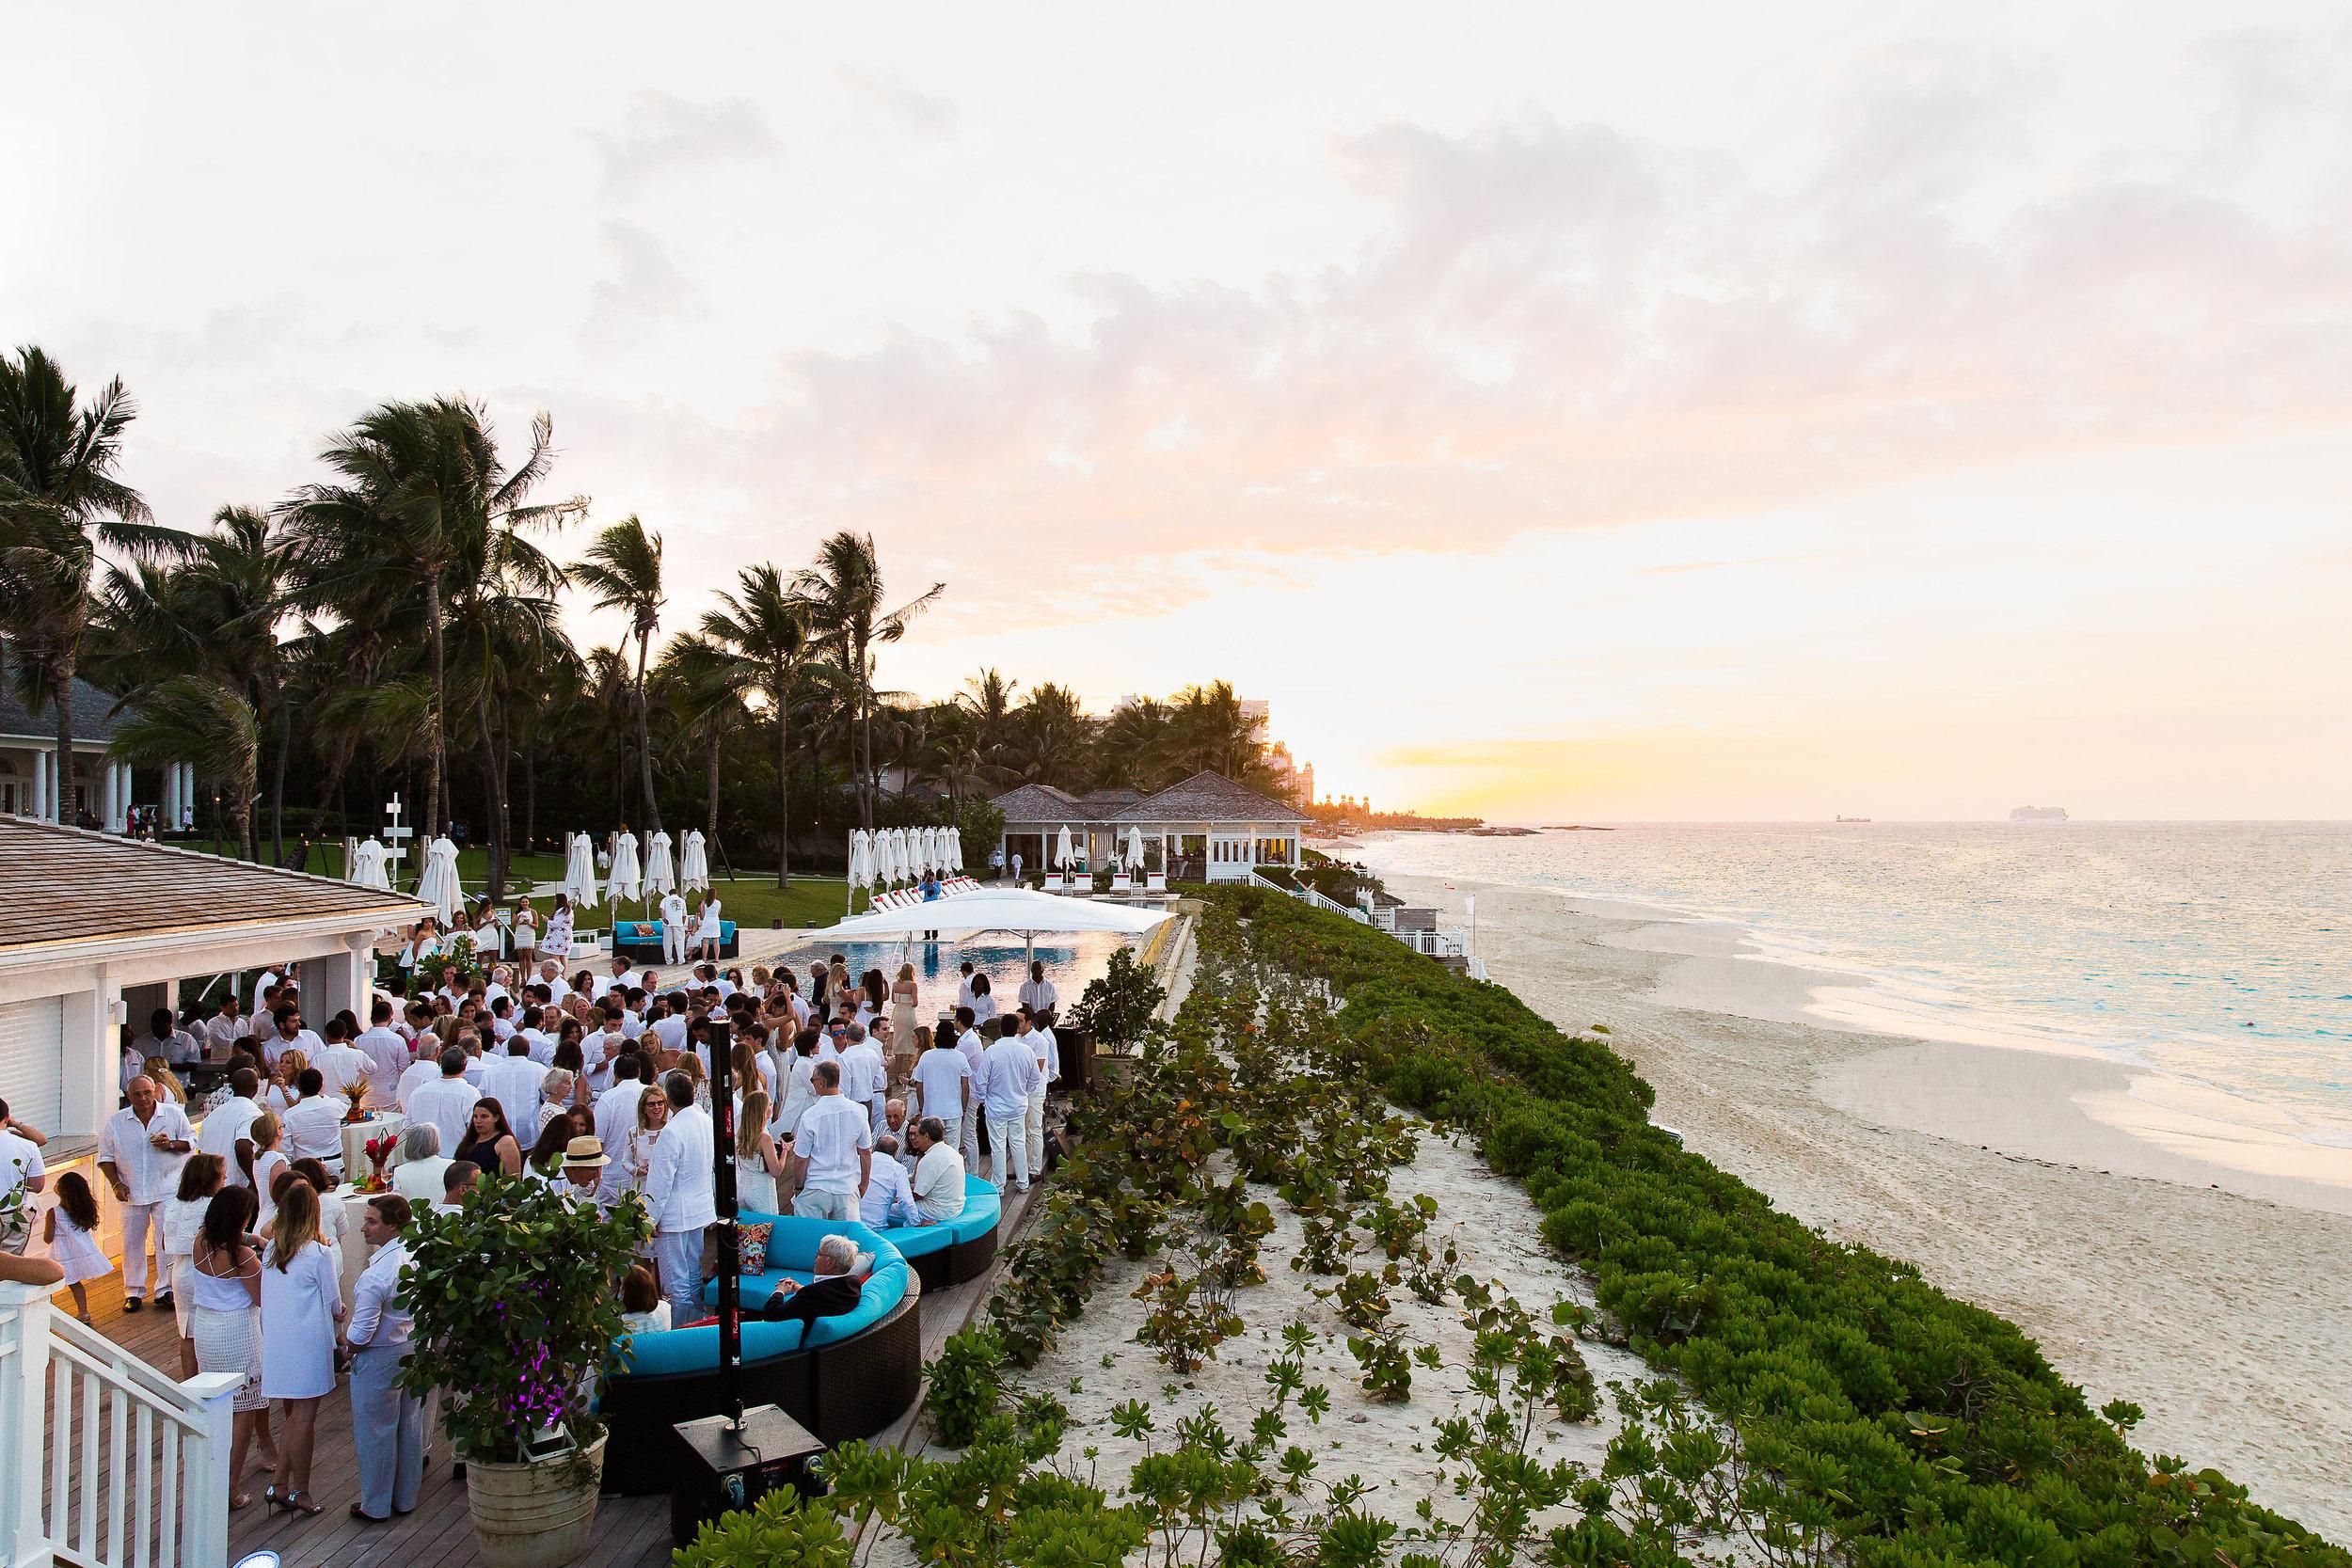 Ceci_New_York_Ceci_Style_Ceci_Johnson_Luxury_Lifestyle_Destination_Bahamas_Wedding_Letterpress_Inspiration_Design_Custom_Couture_Personalized_Invitations_36.jpg